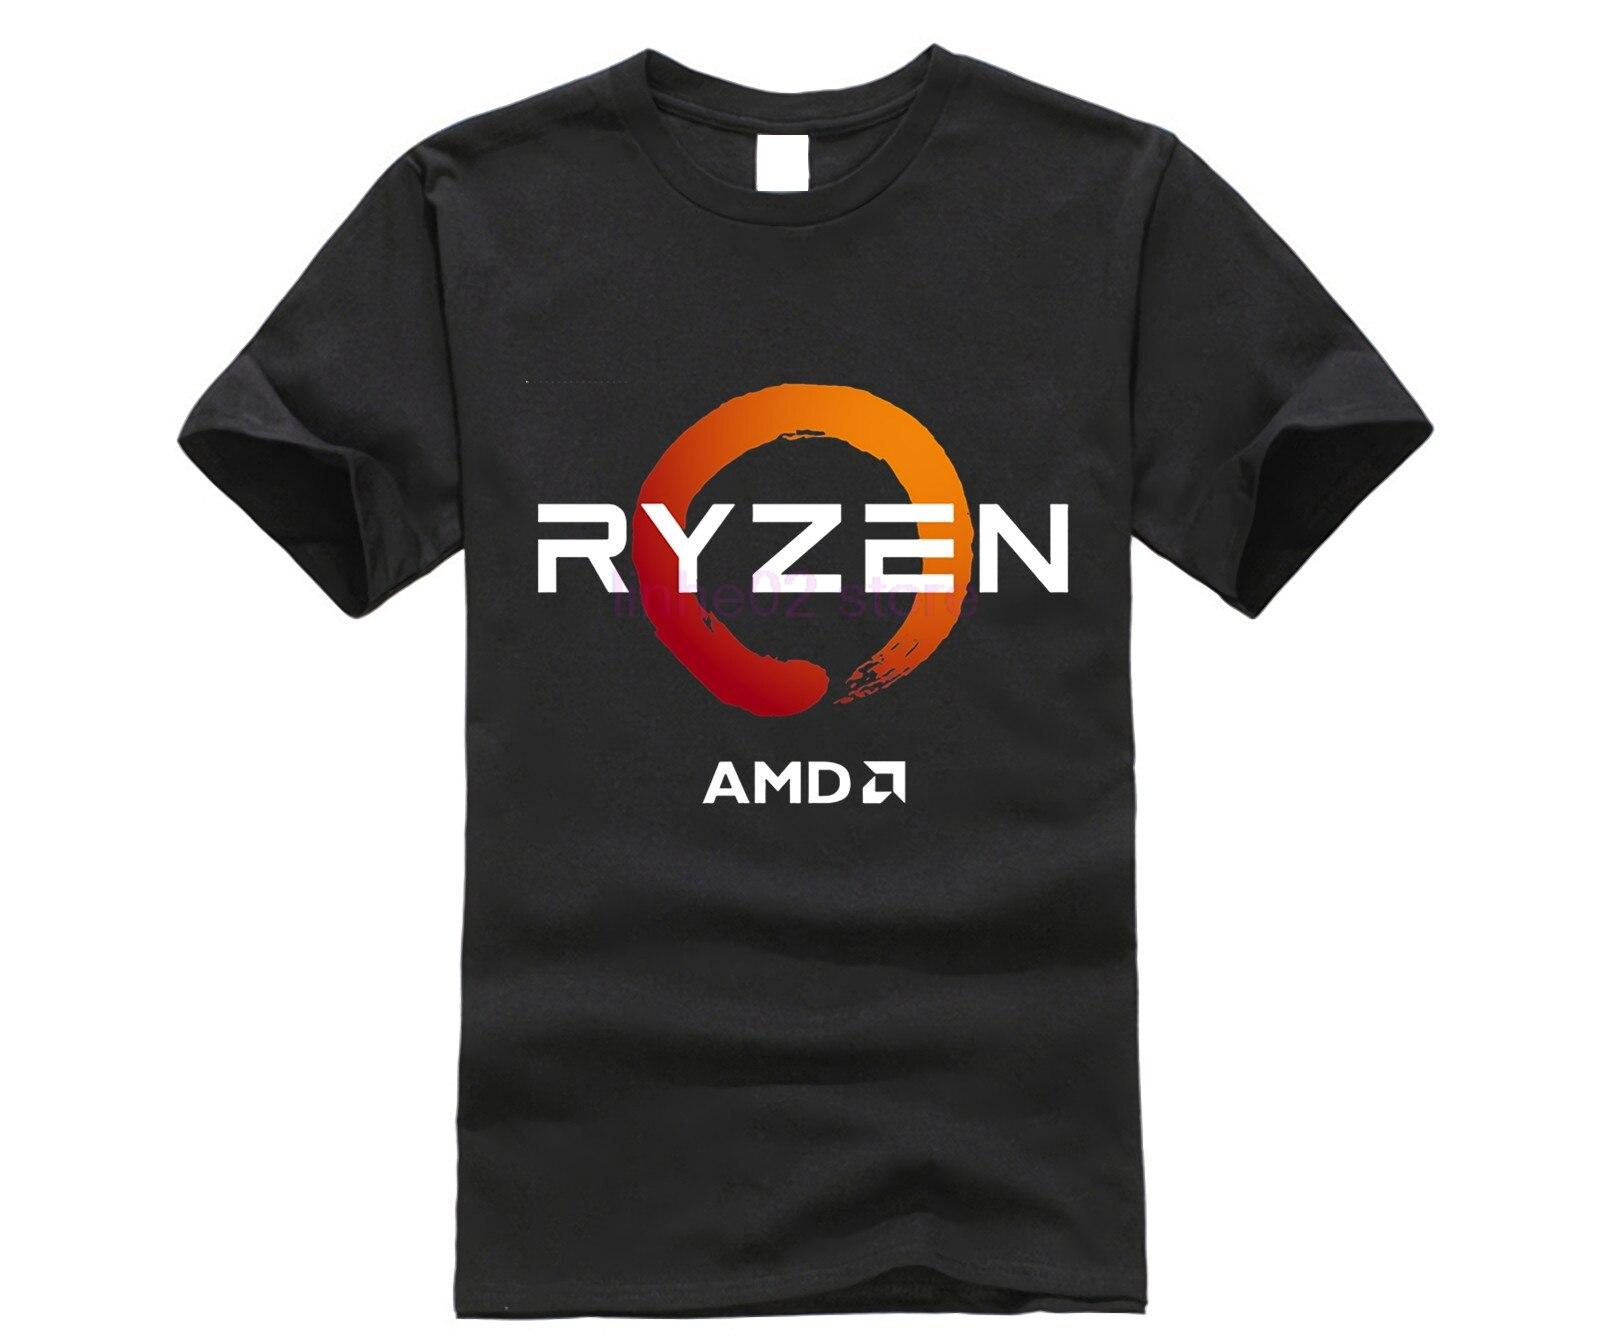 PC CP CPU Uprocessor AMD RYZEN T Shirt geek programmer tees Gaming camiseta Computer ZEN Peripherals cotton geek T-Shirt